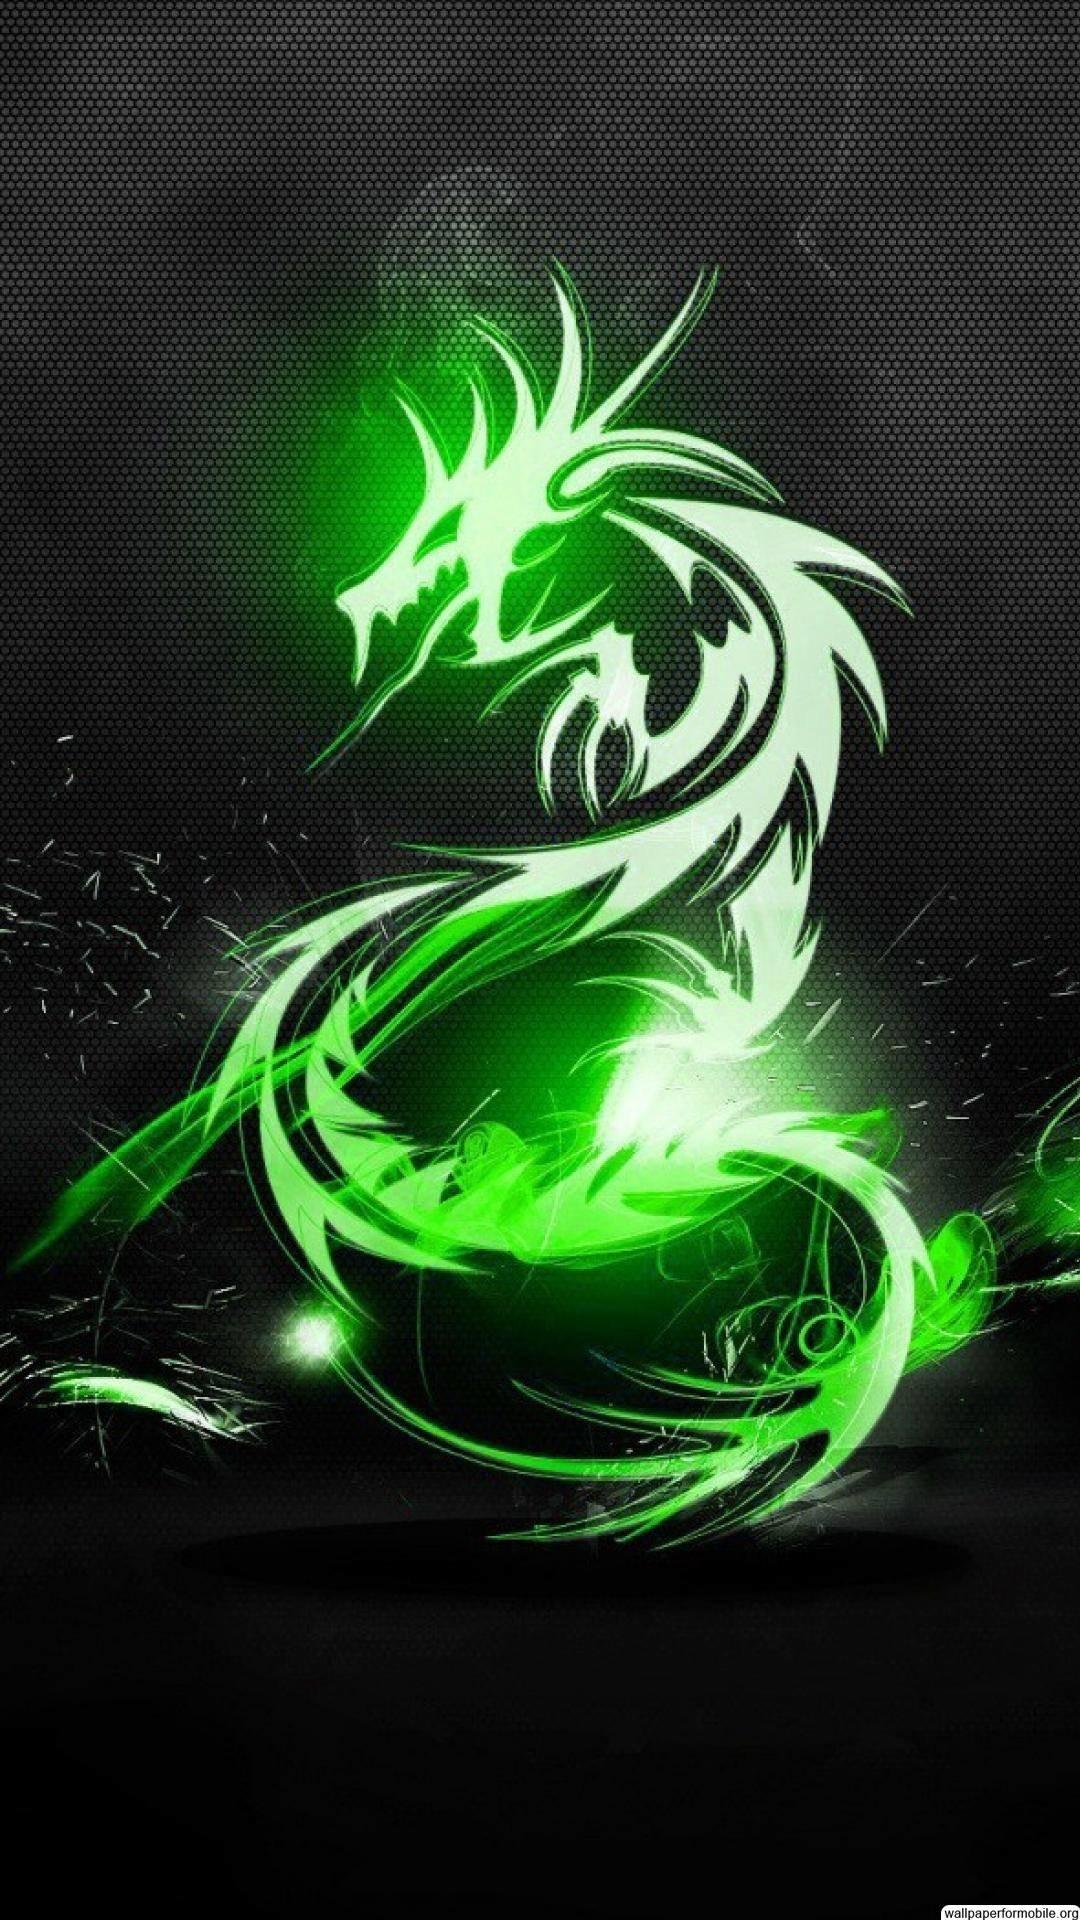 Cool Dragon Wallpaper 54 Images